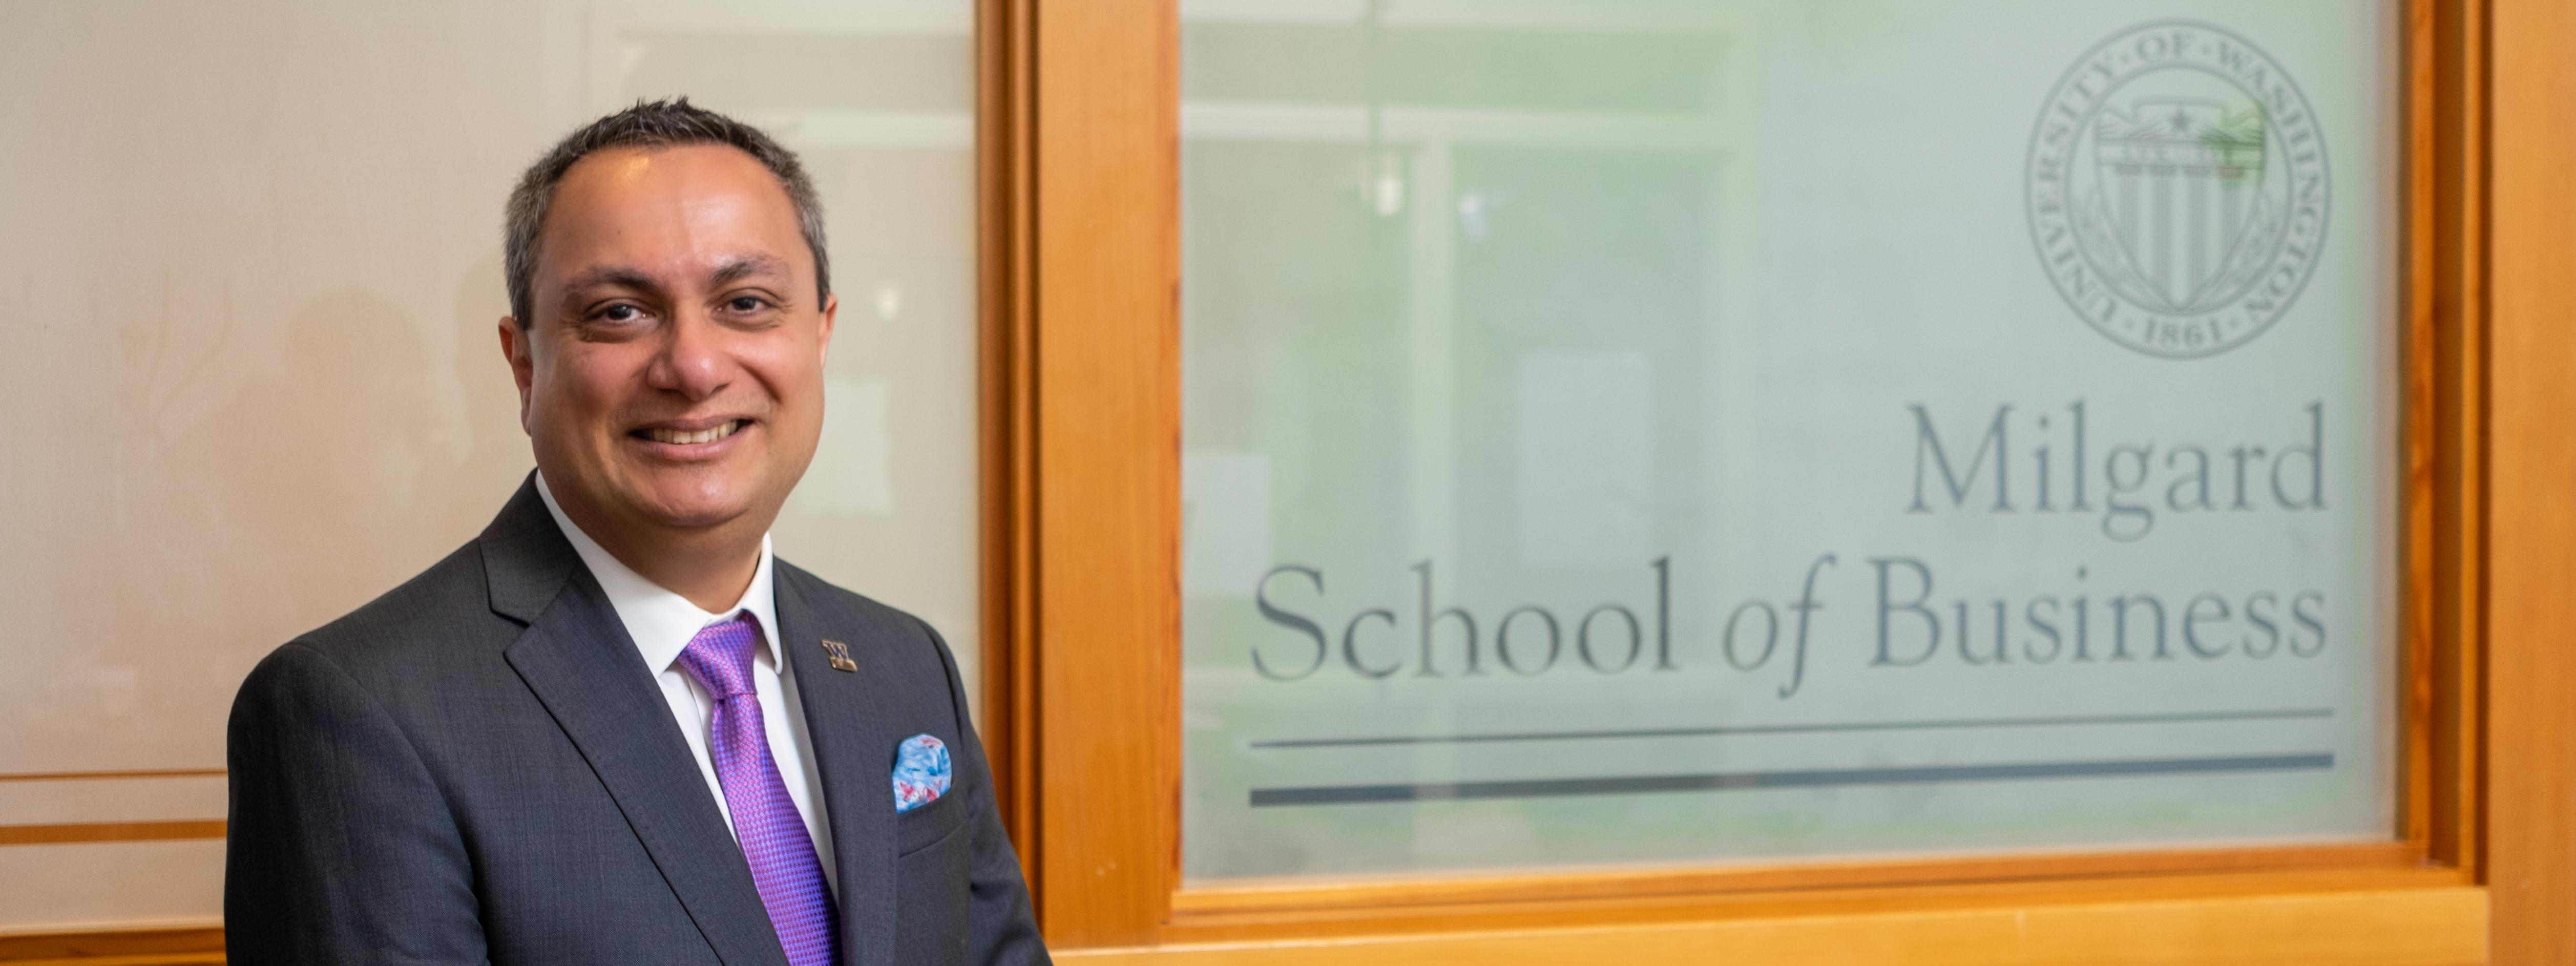 Headshot of Dean Altaf Merchant at the Milgard School of Business